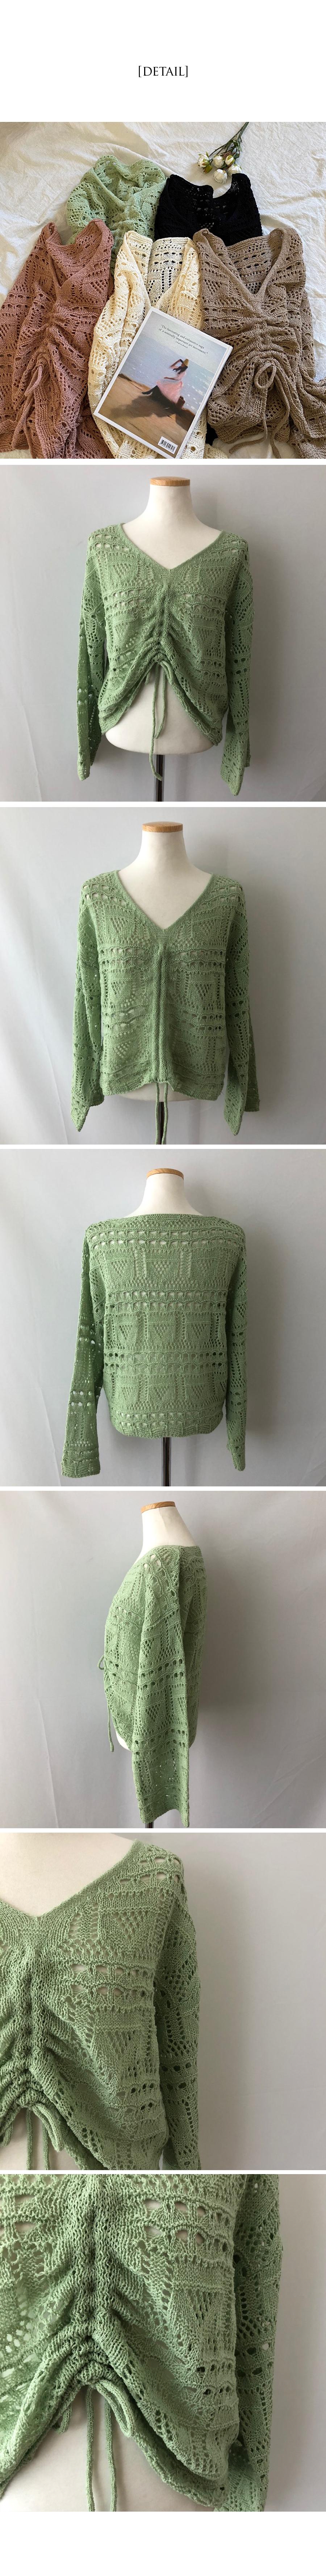 Bohemian Punching Booklet Shirring Knitwear